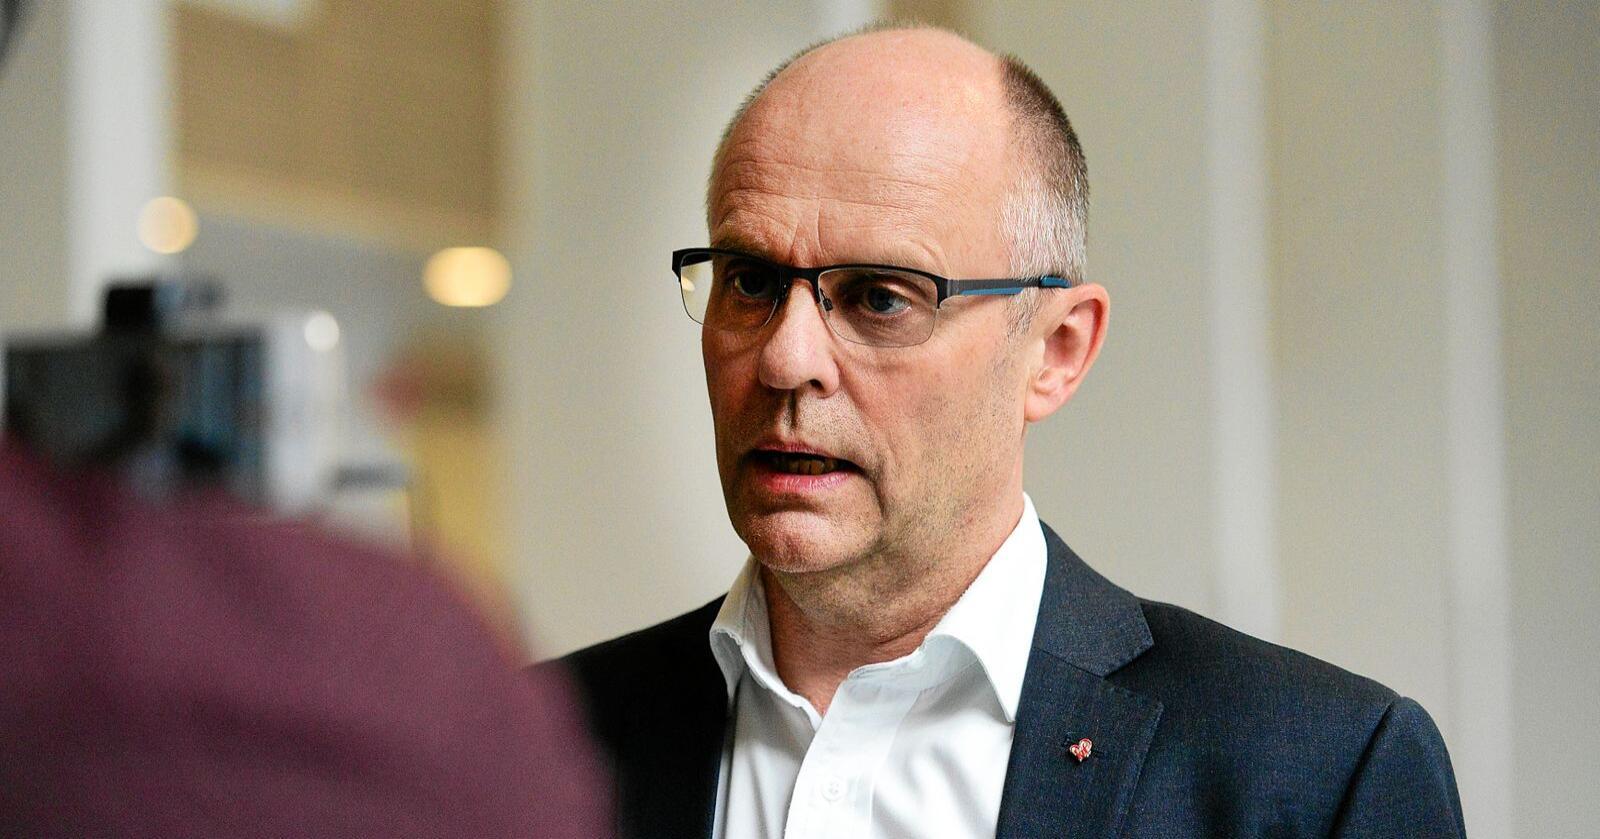 Steinar Reiten, stortingsrepresentant for KrF. Foto: Siri Juell Rasmussen